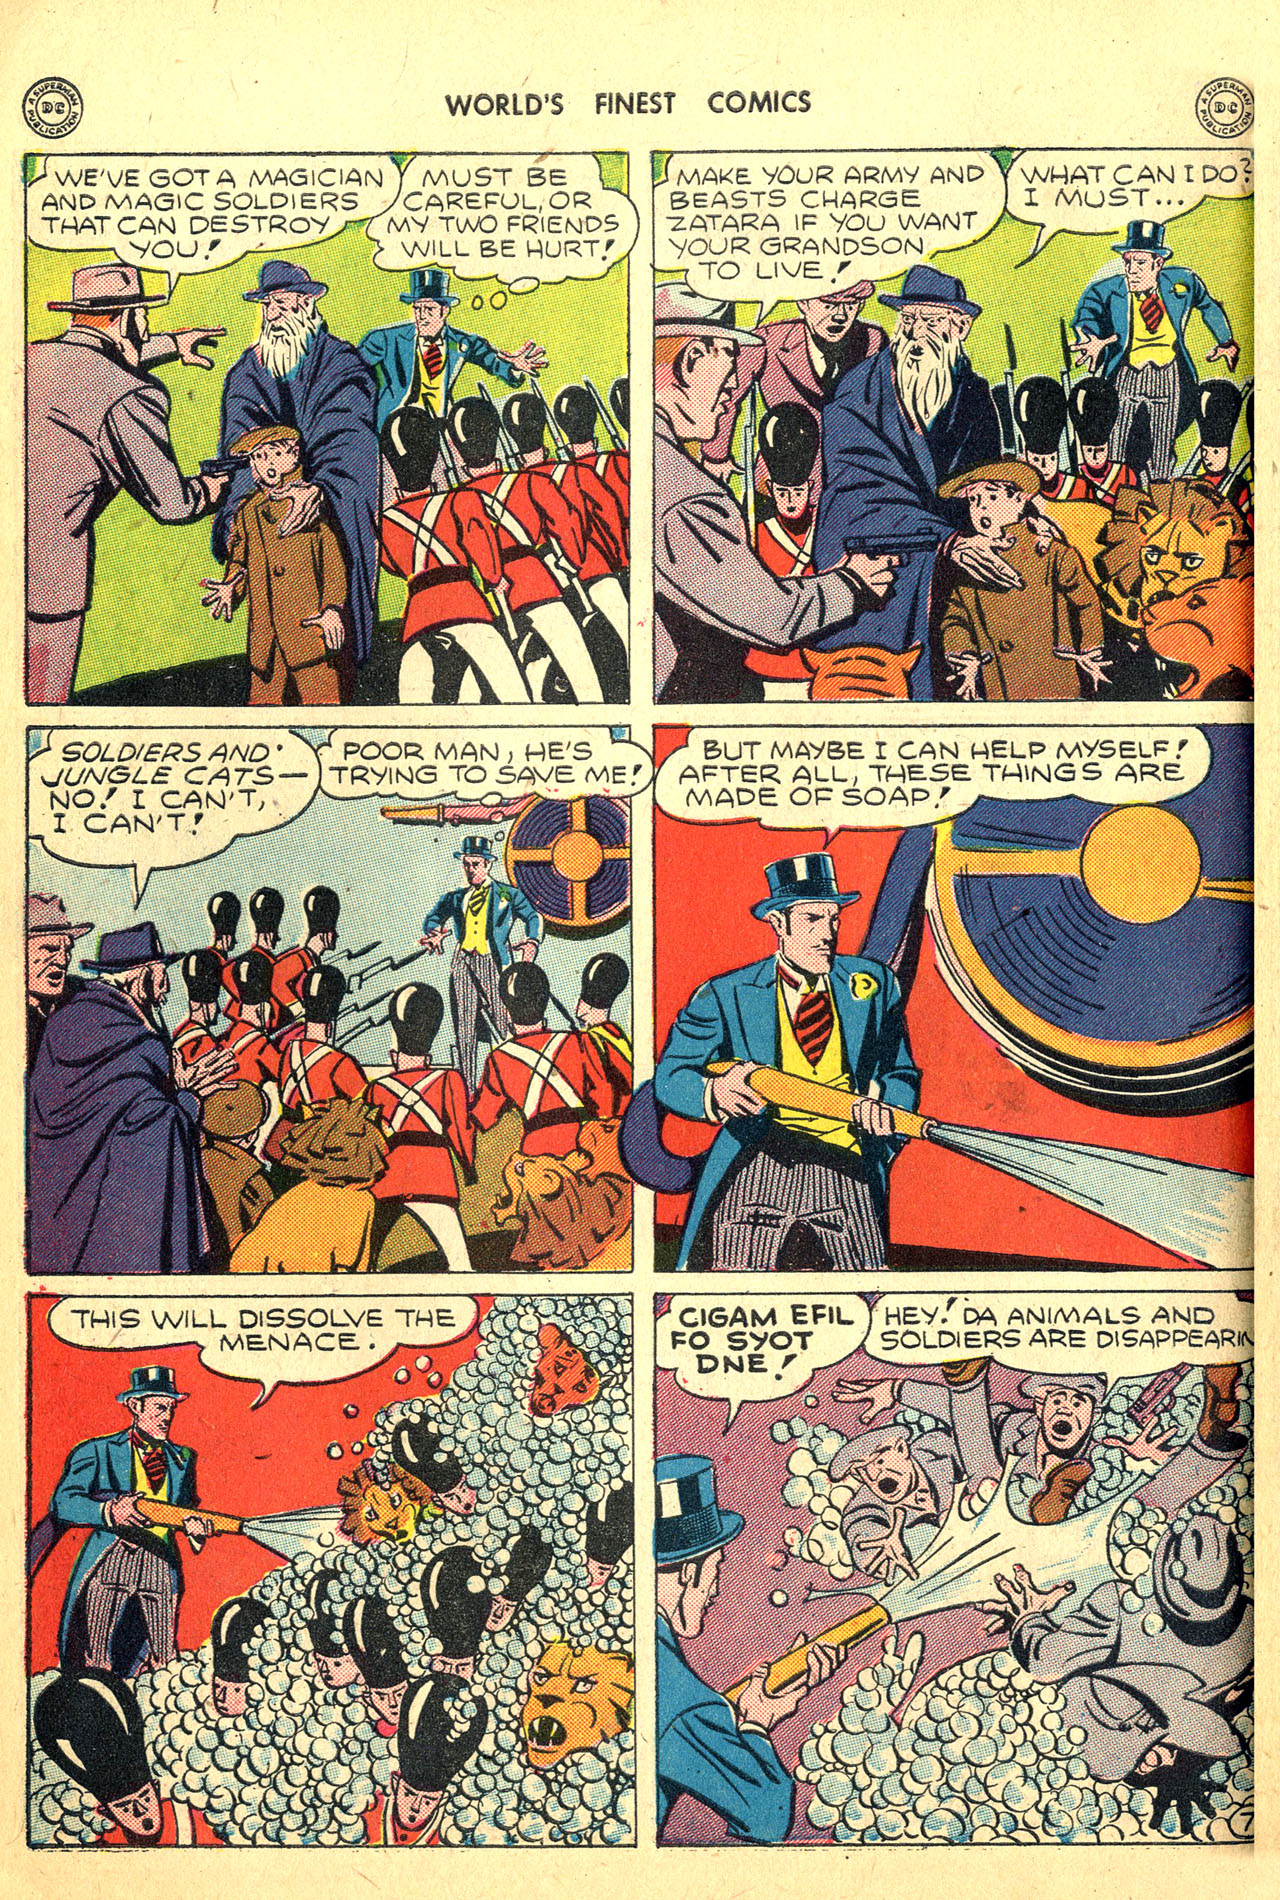 Read online World's Finest Comics comic -  Issue #18 - 32